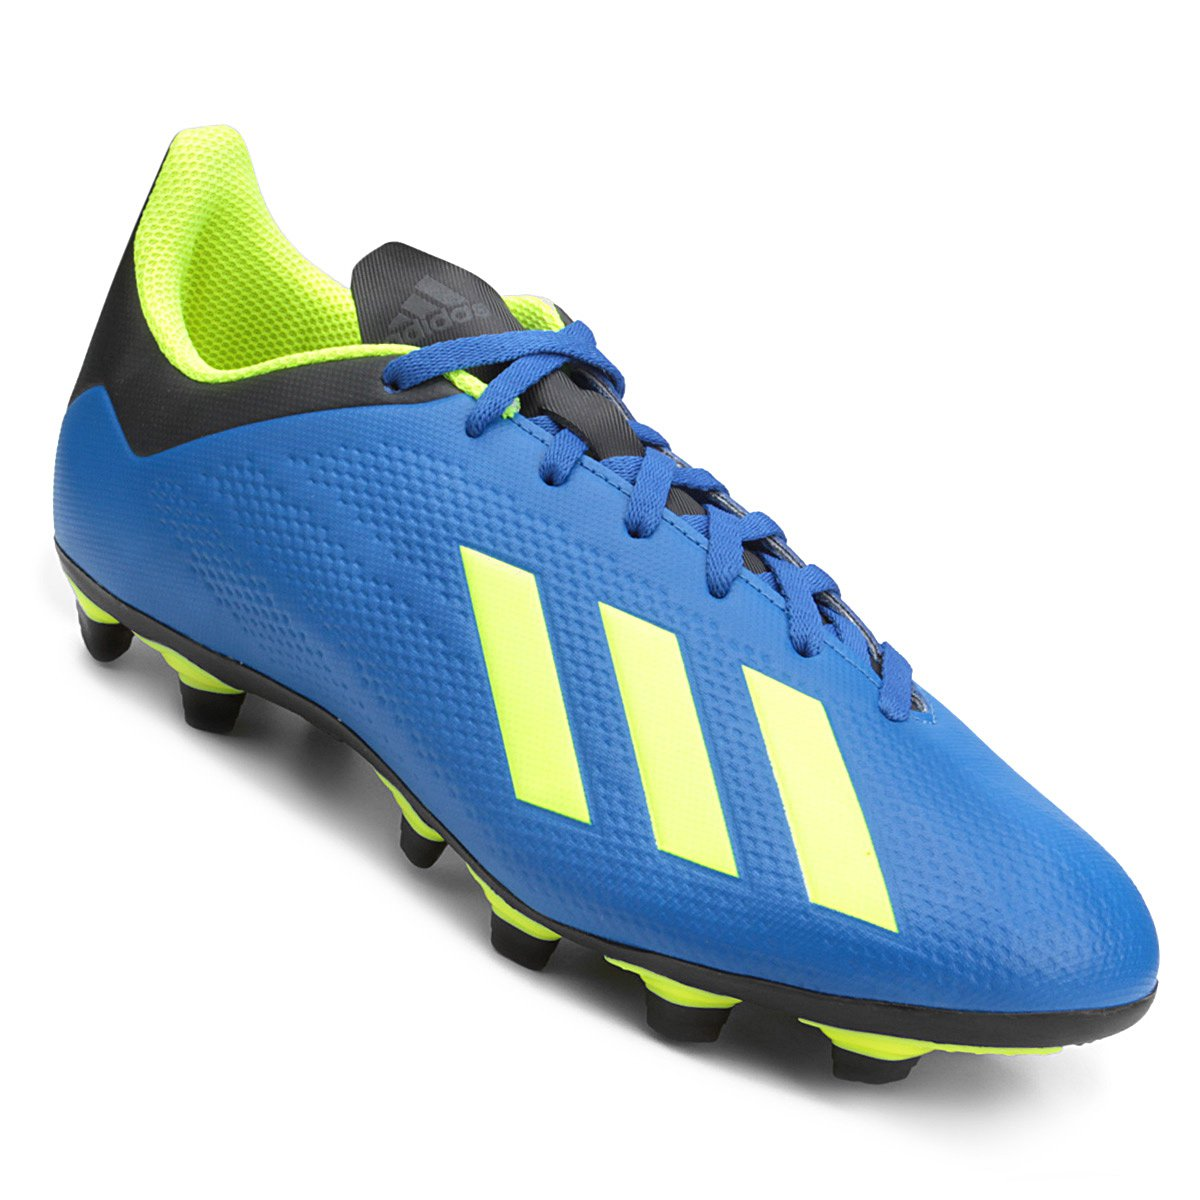 8b4bc8cd2f Chuteira Campo Adidas X 18 4 FG - Azul e amarelo - Compre Agora ...